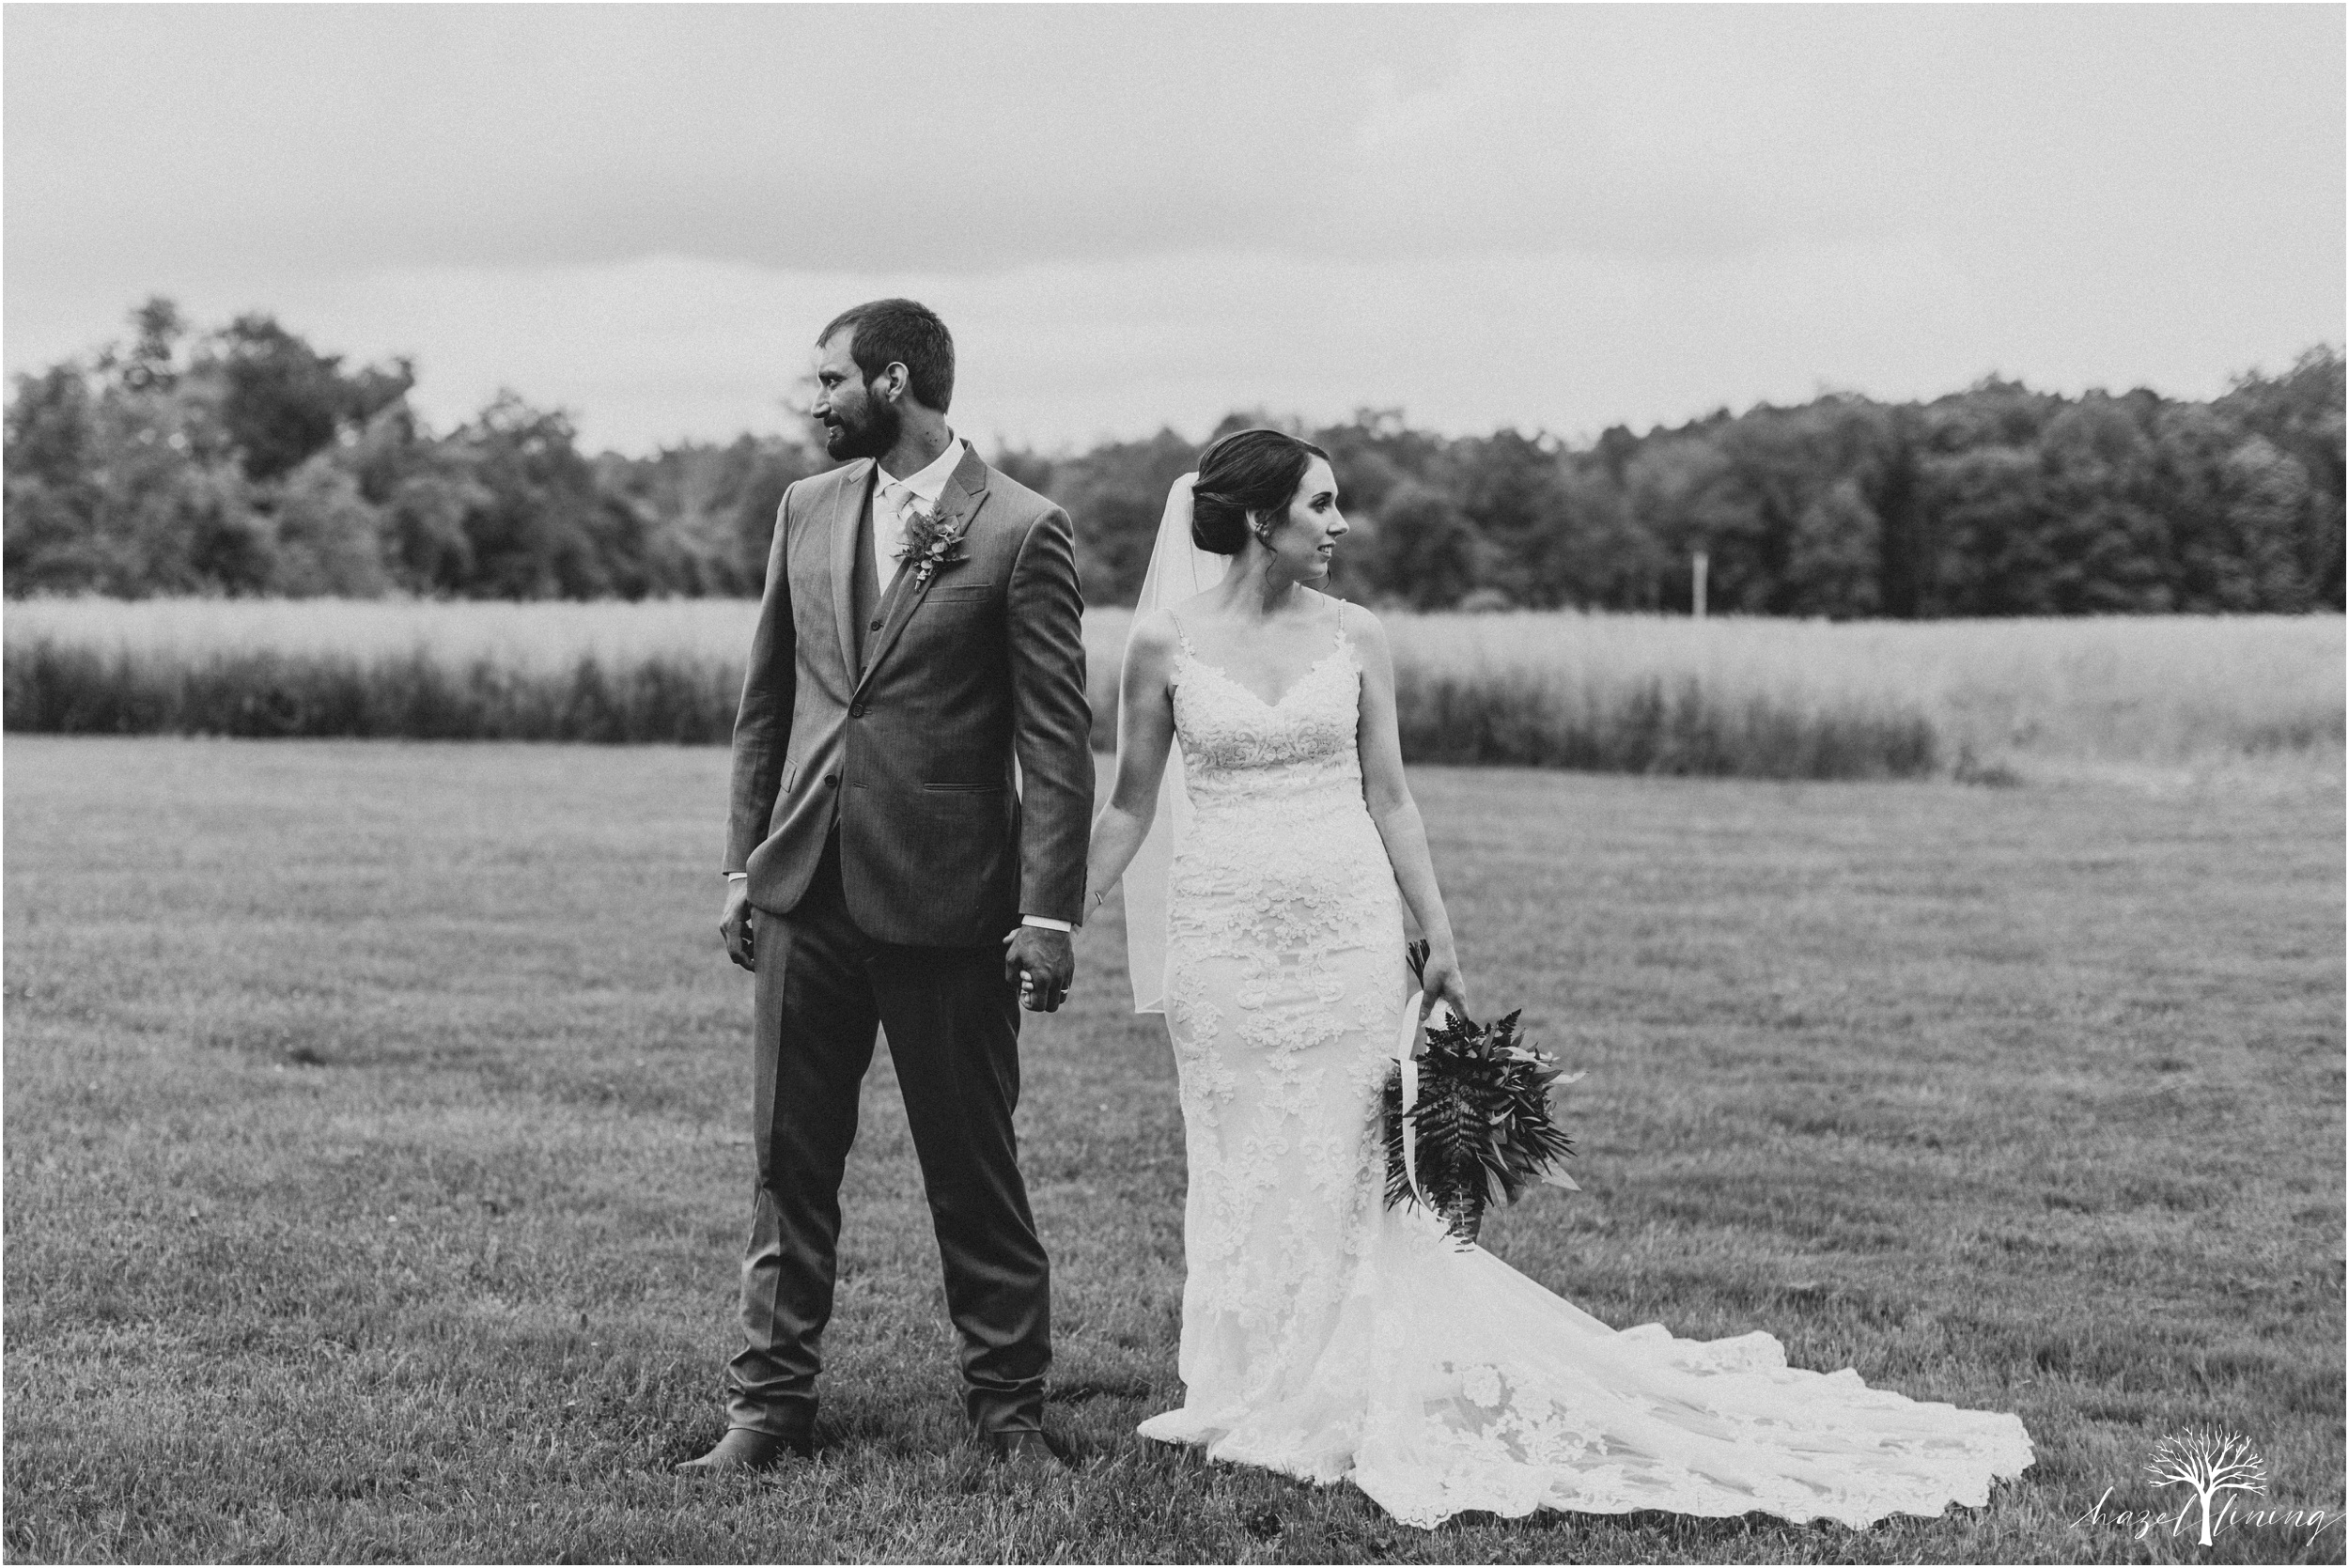 hazel-lining-travel-wedding-elopement-photography-lisa-landon-shoemaker-the-farm-bakery-and-events-bucks-county-quakertown-pennsylvania-summer-country-outdoor-farm-wedding_0094.jpg